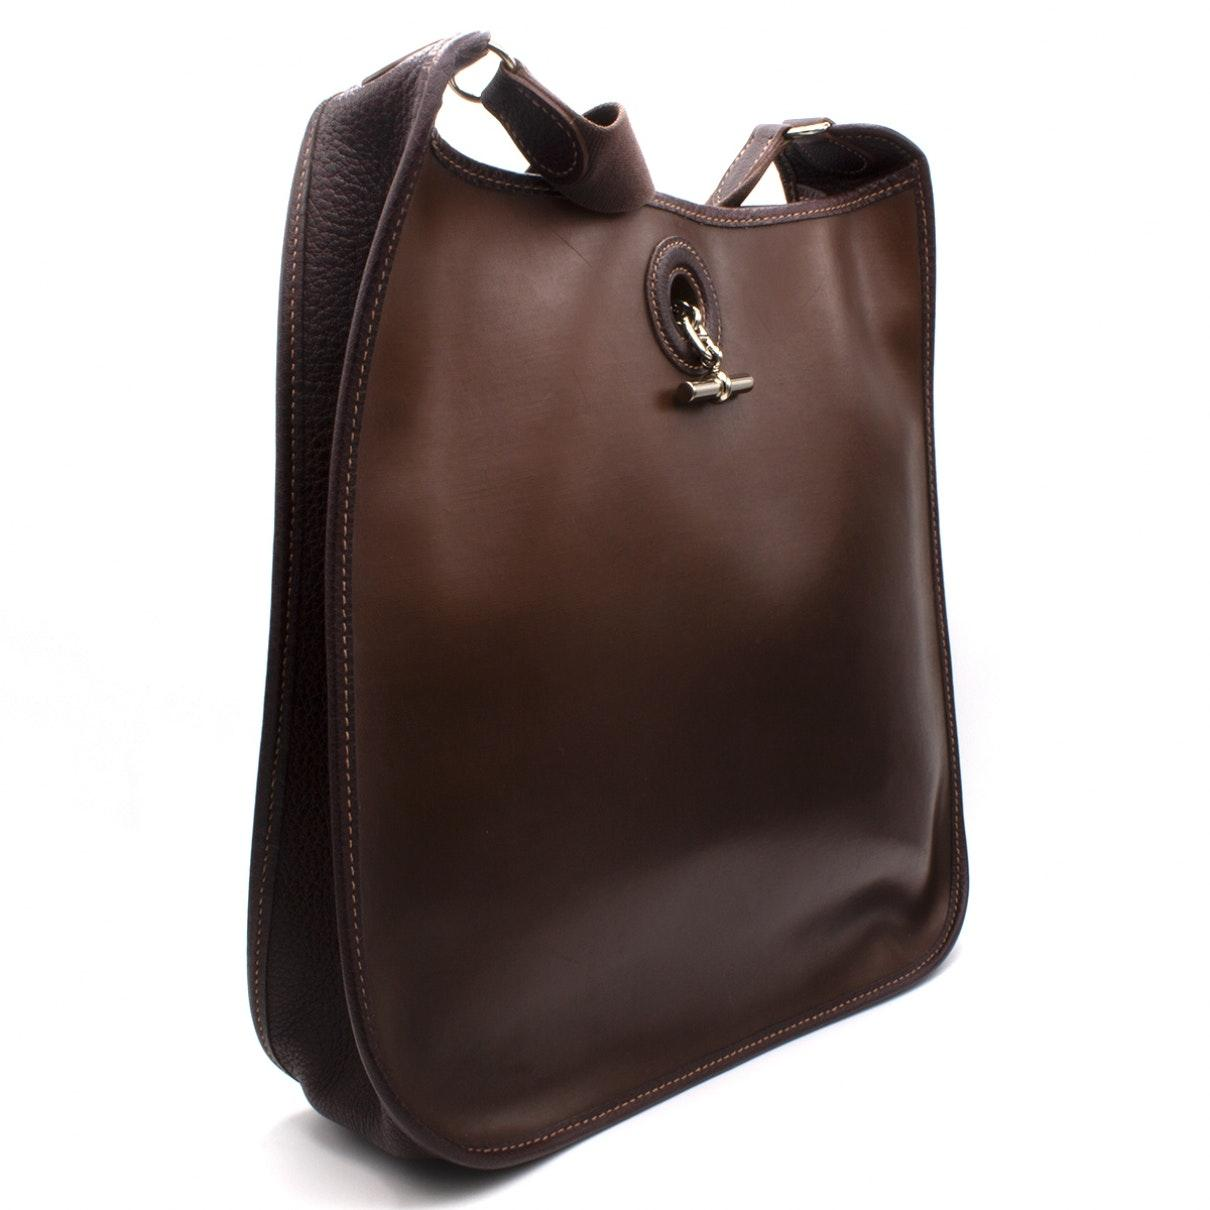 Sac à main Vespa en Cuir Marron Hermès en coloris Marron tKz9